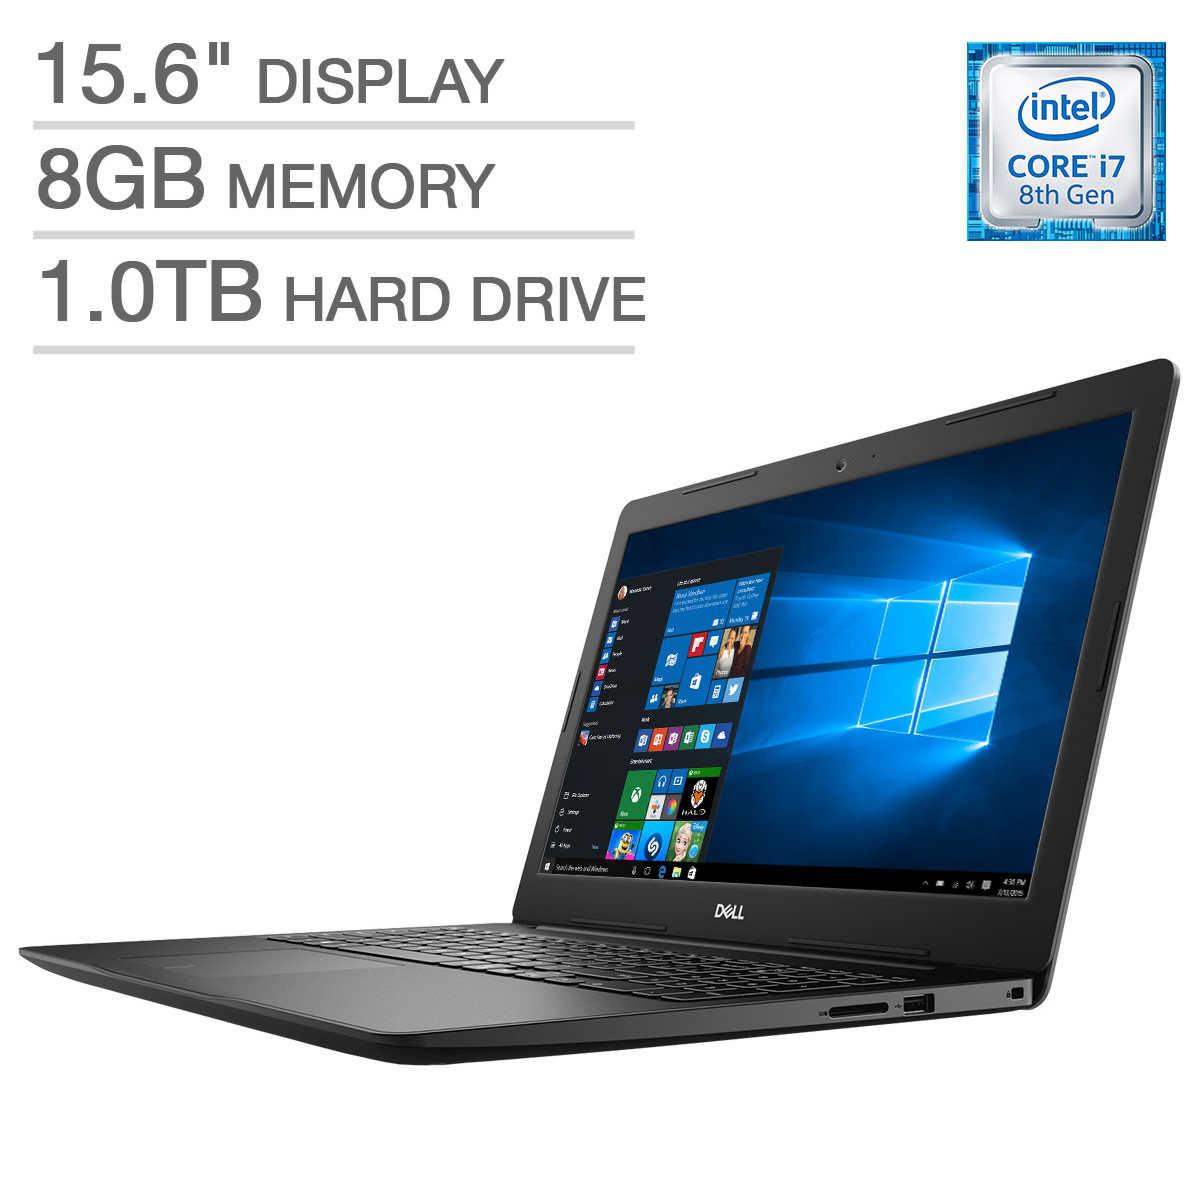 Dell Inspiron 15 3000 Laptop - Intel Core i7